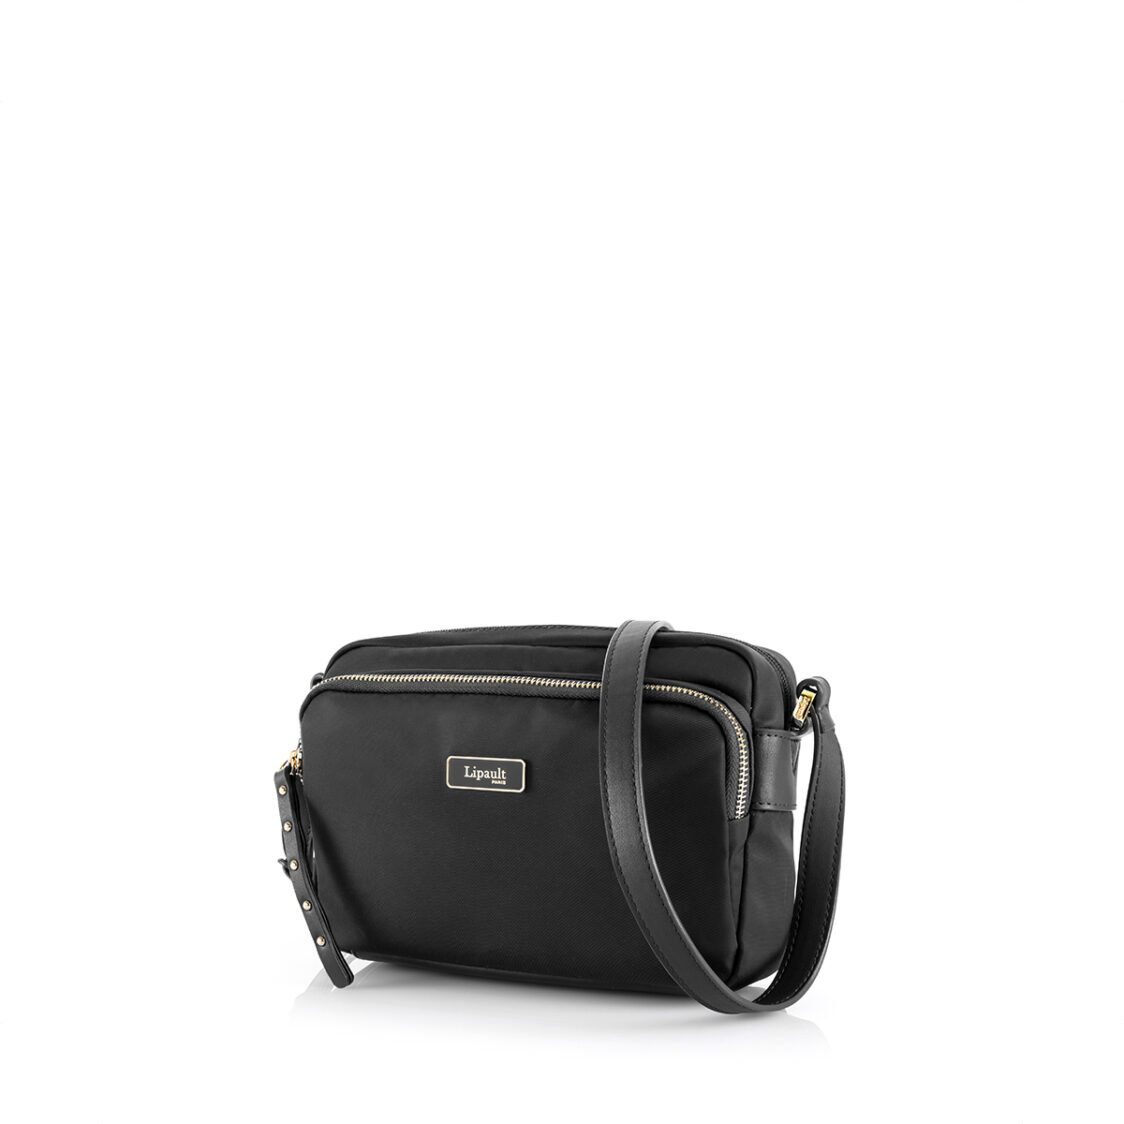 Lipault Paris Plume Essentials Crossbody Bag GQ401013